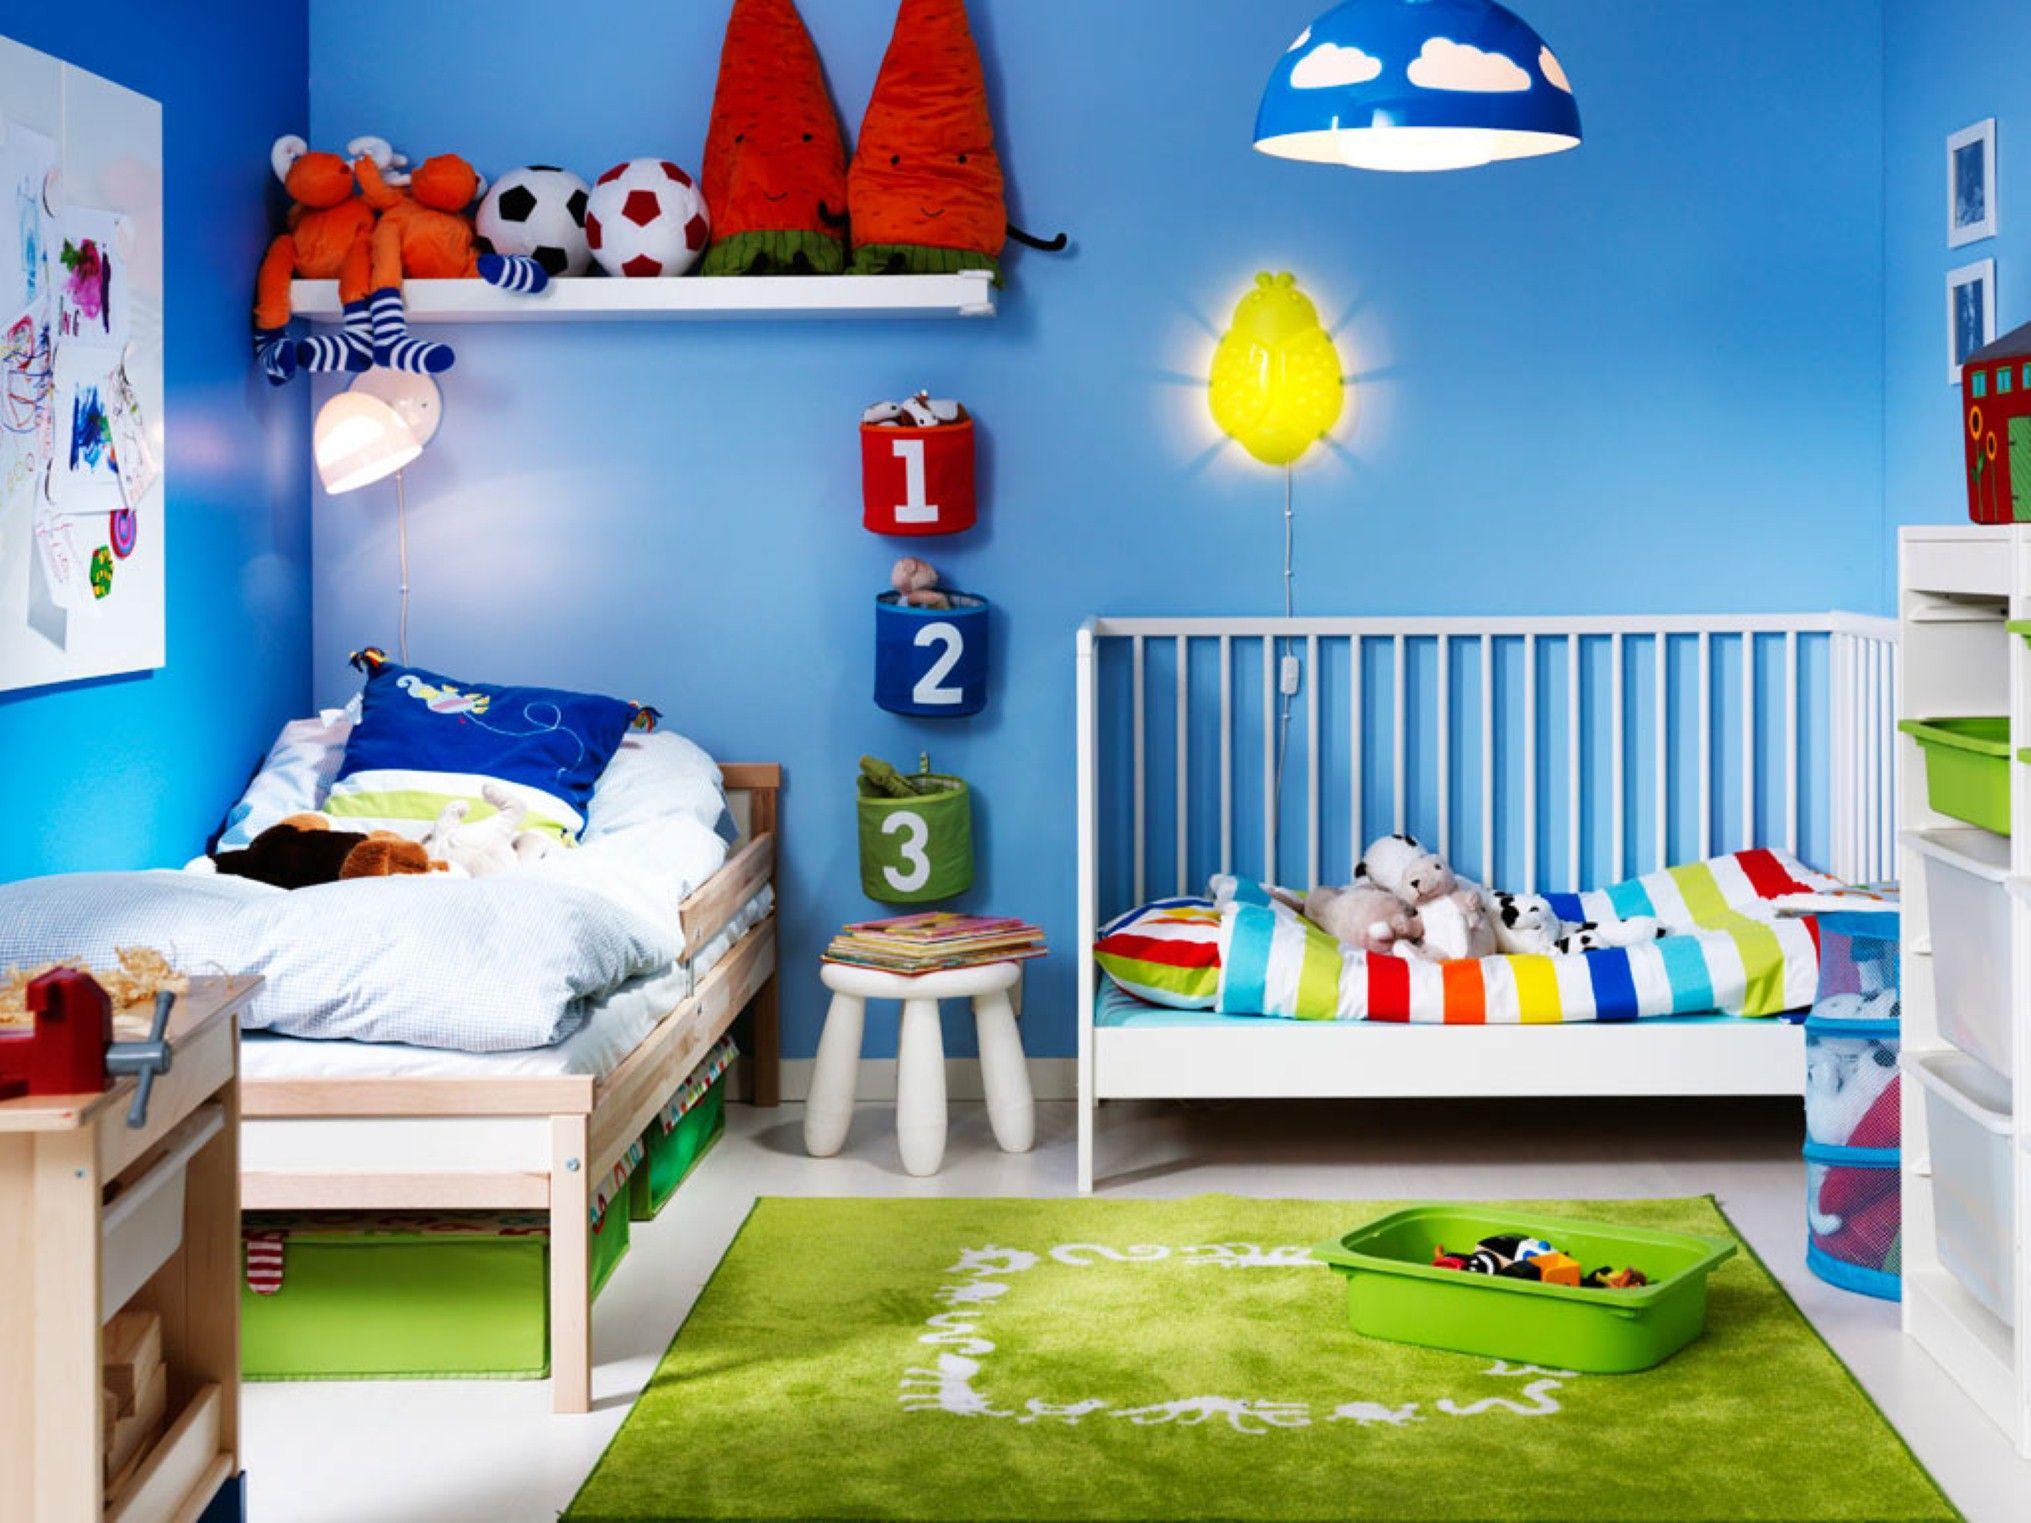 Bedroom Impressive Minimalist Sky Blue Kids Bedroom With Green Rug .